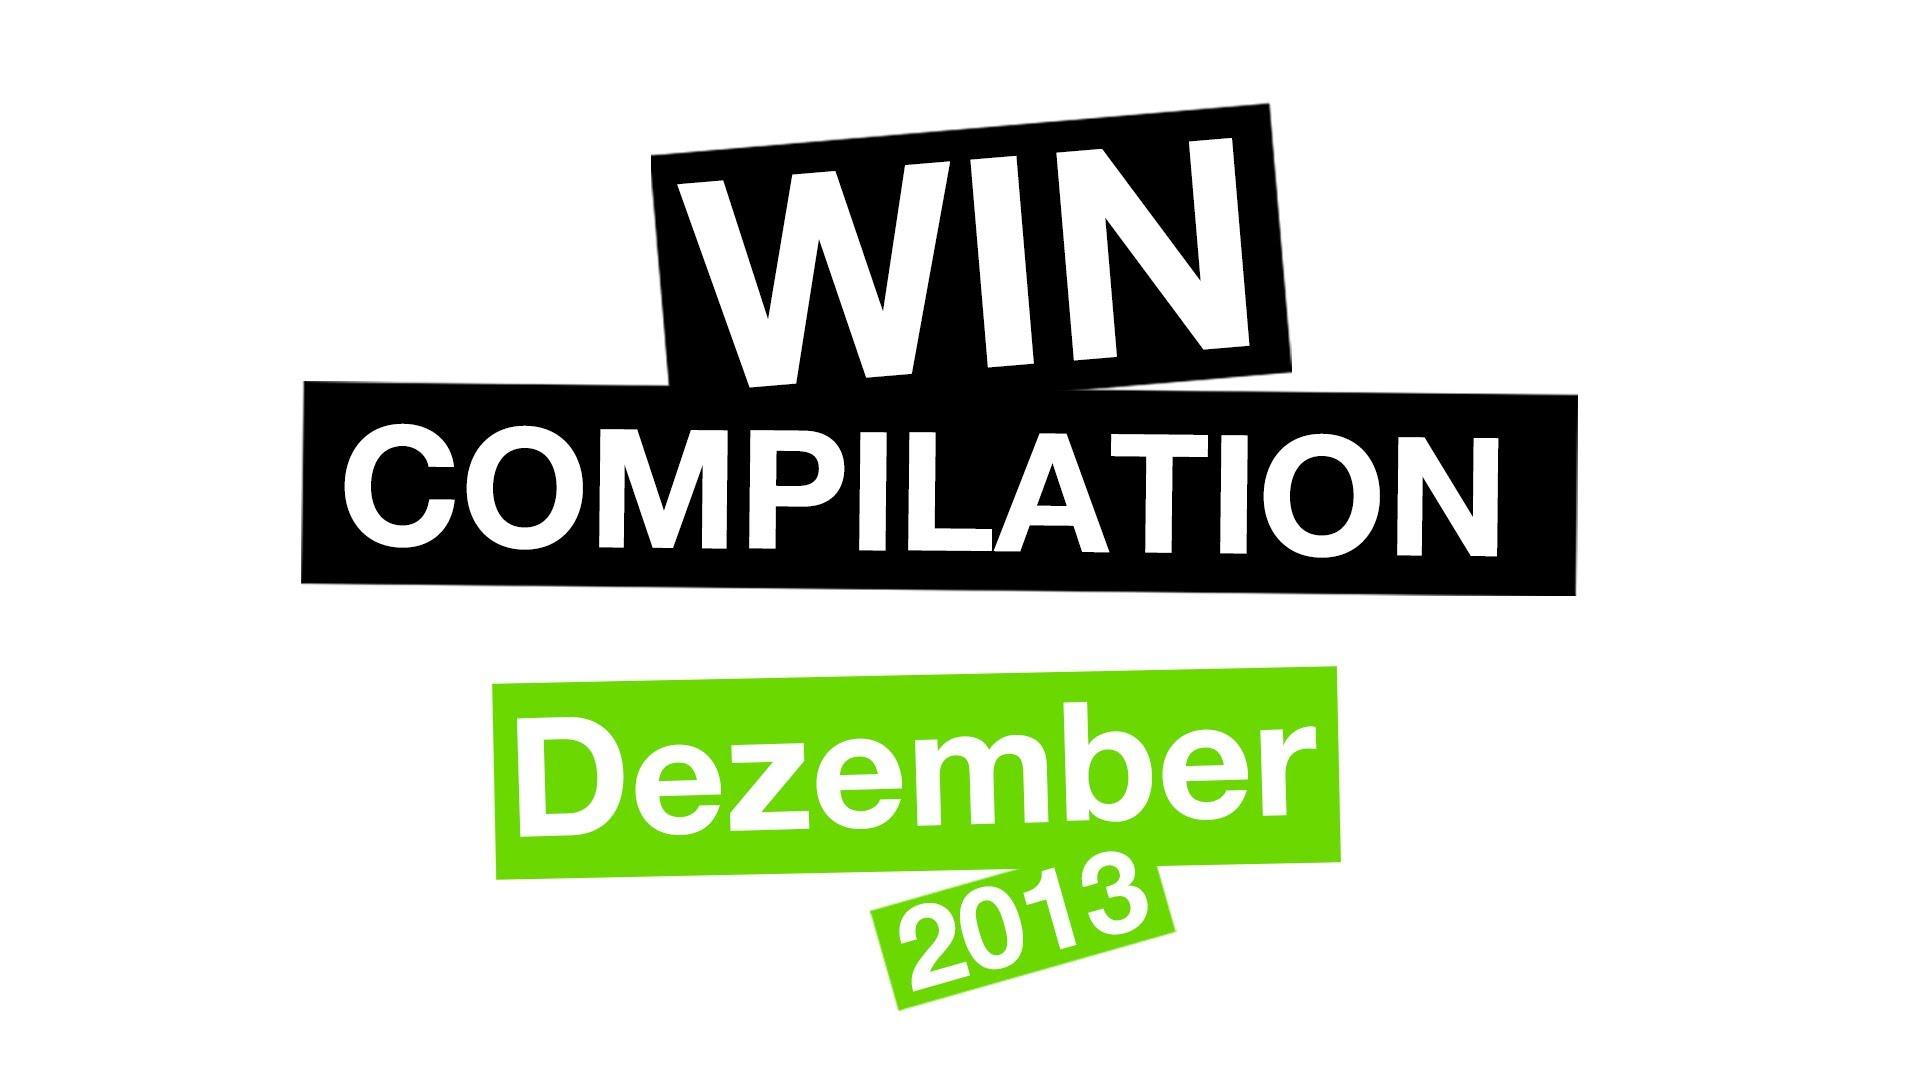 WIN Compilation December 2013